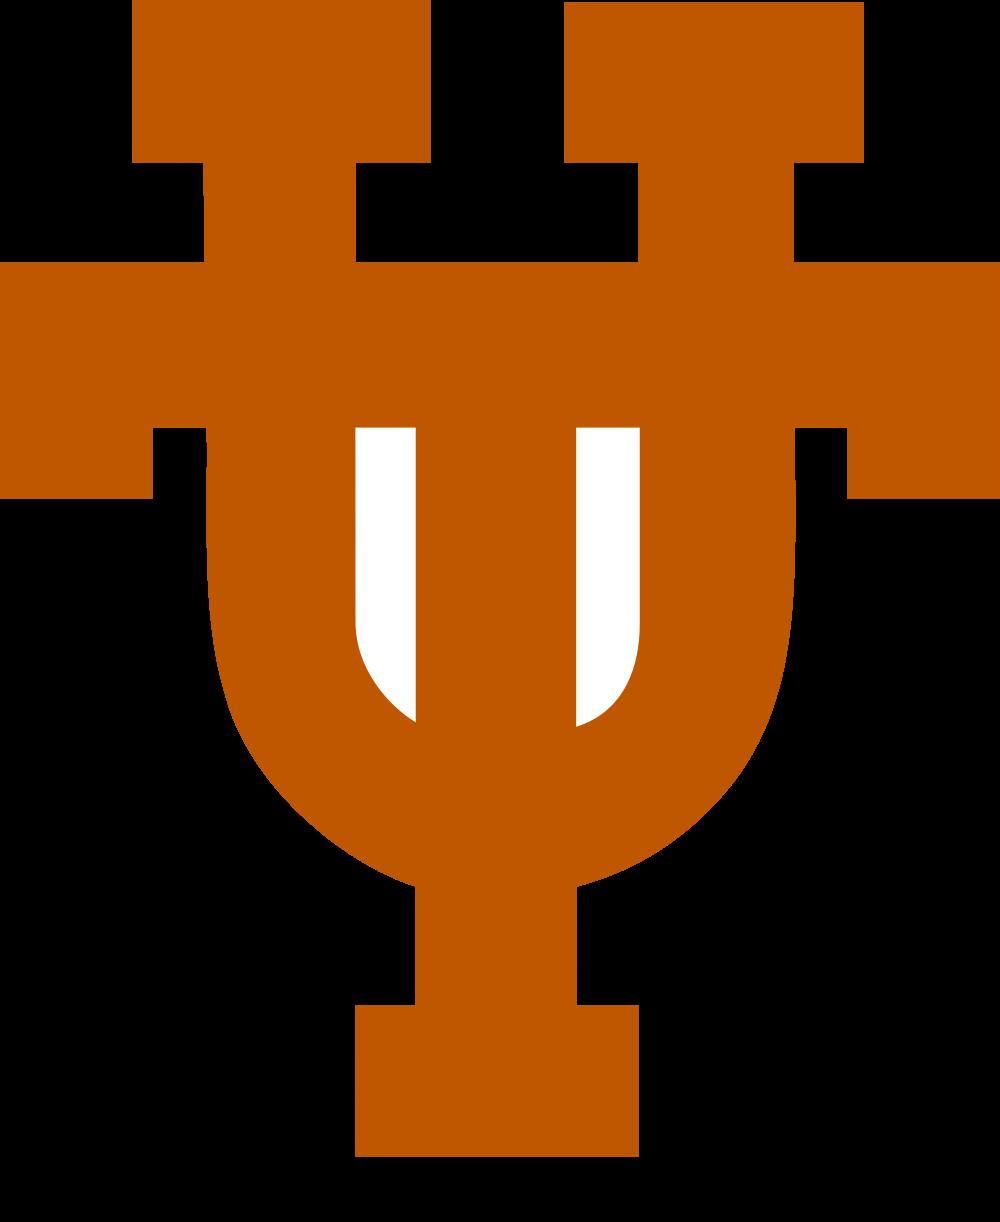 File ut t text. Longhorn clipart mascot